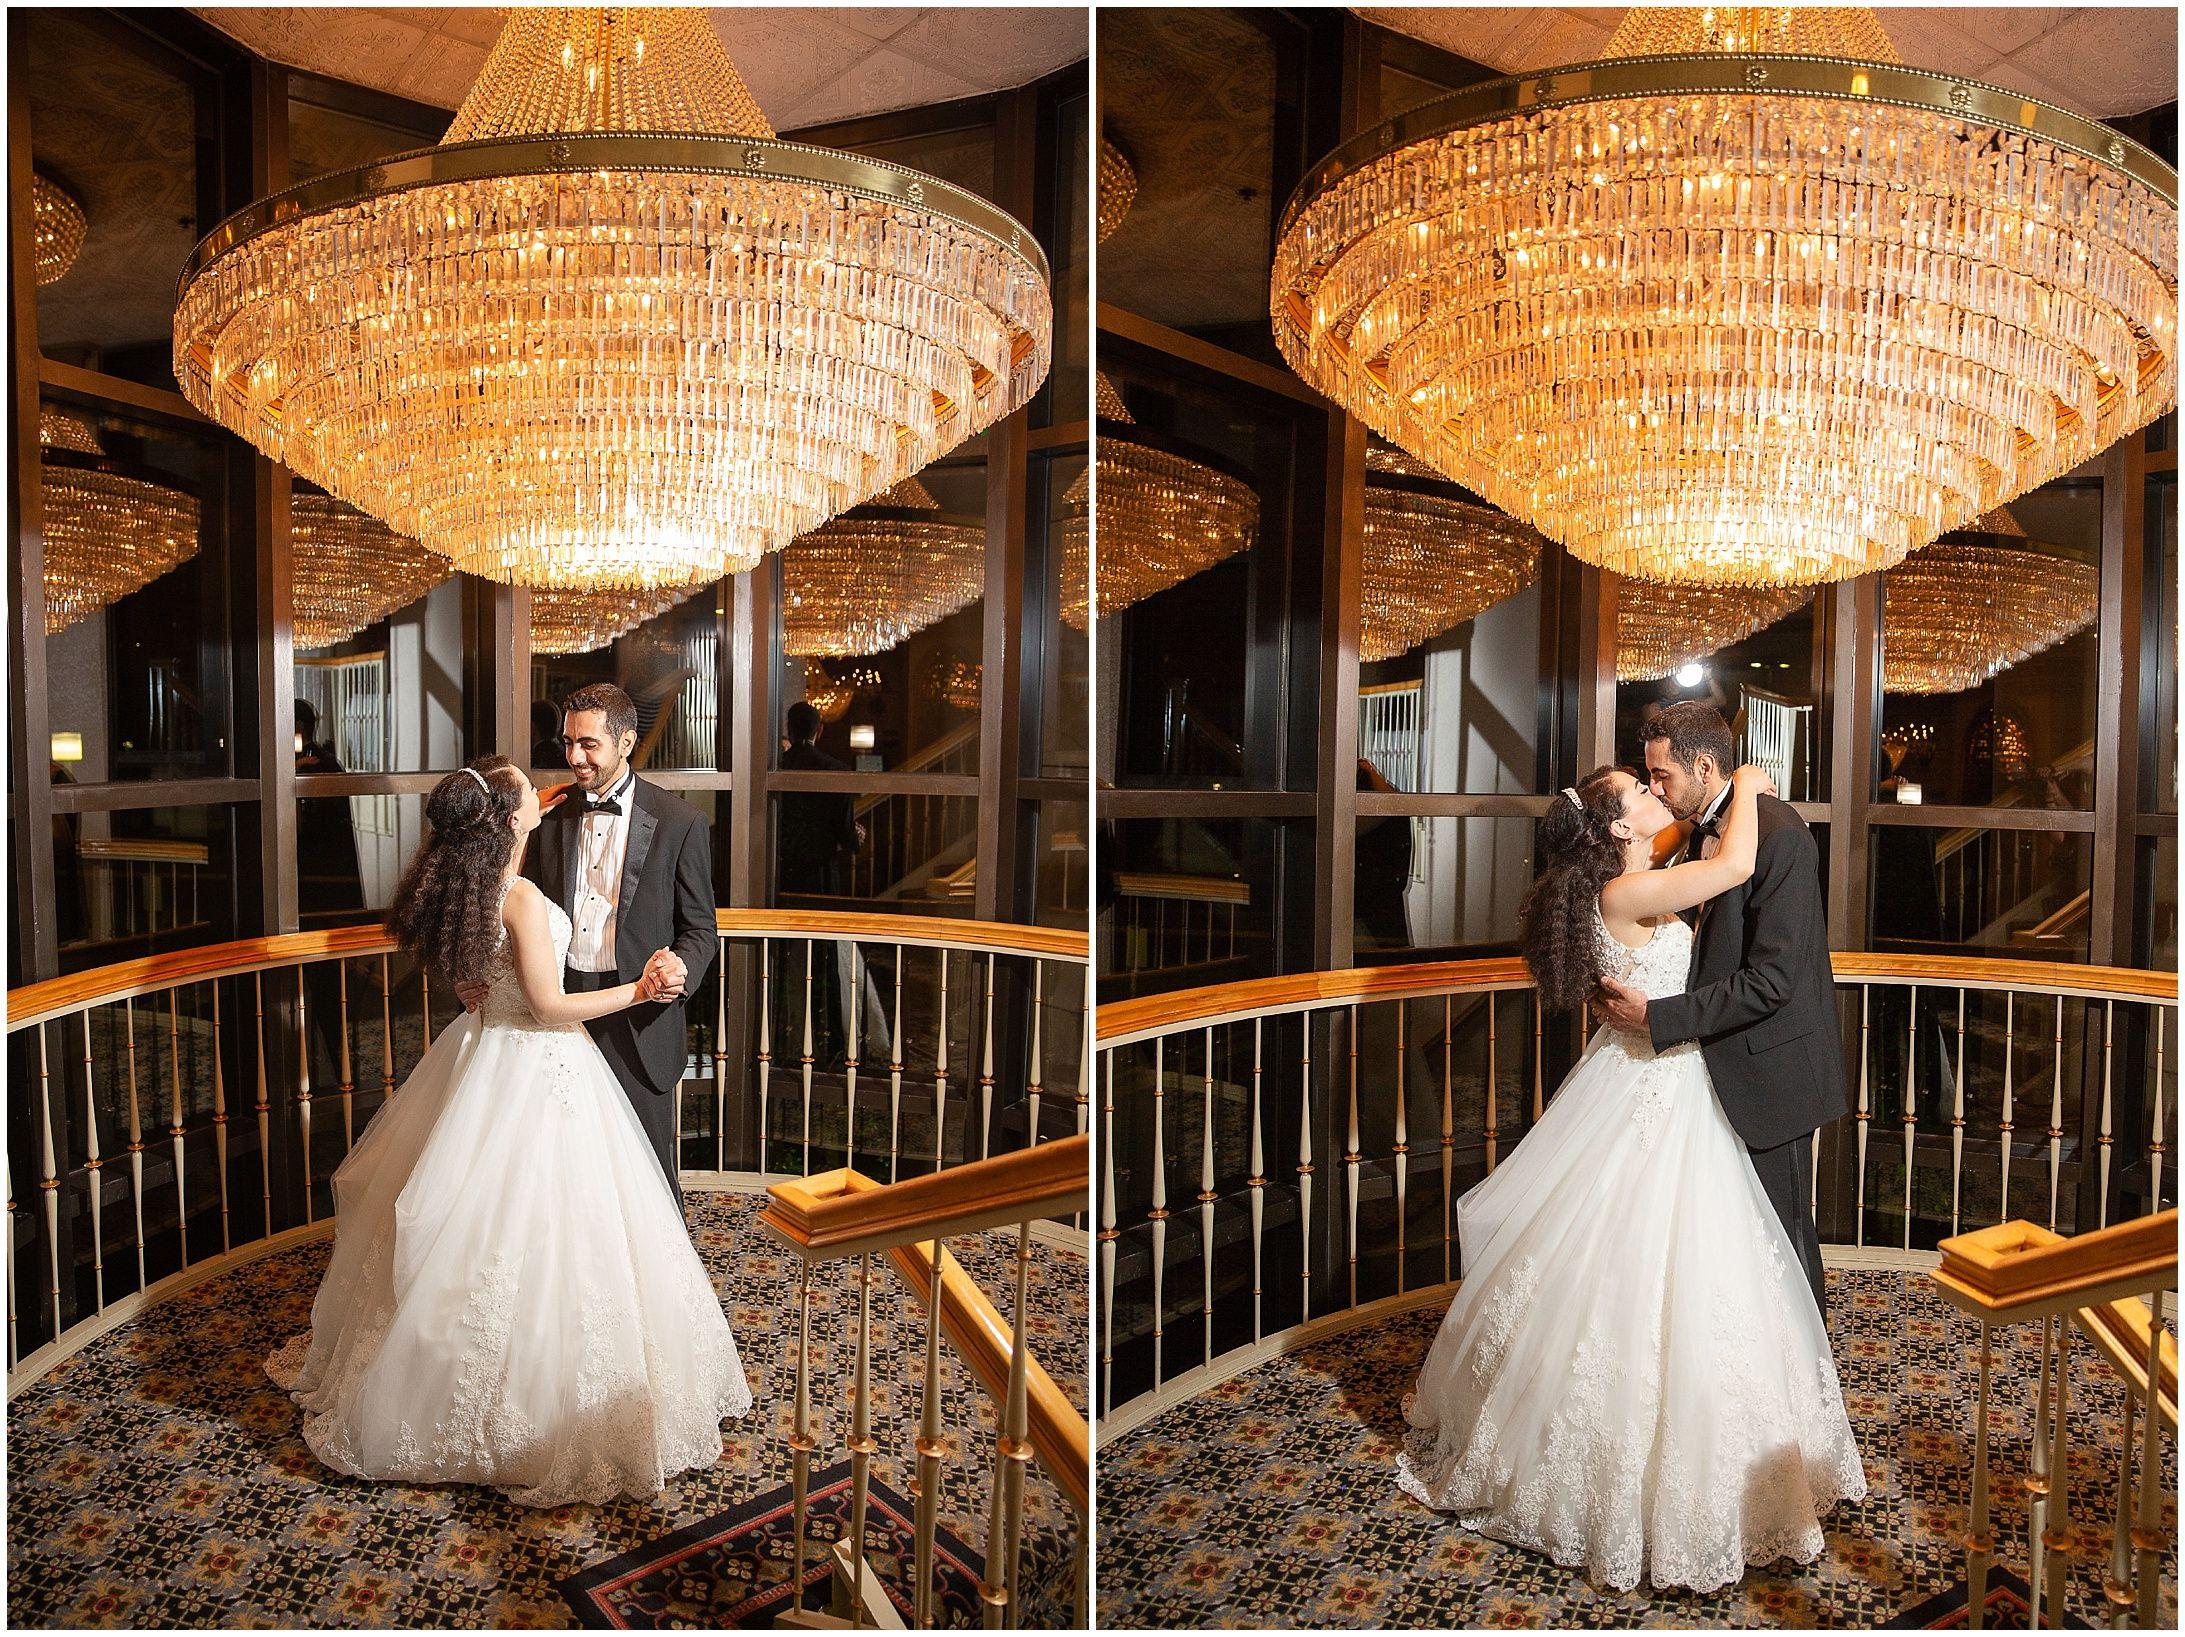 Sara & Younes Lebanese wedding, Washington dc wedding